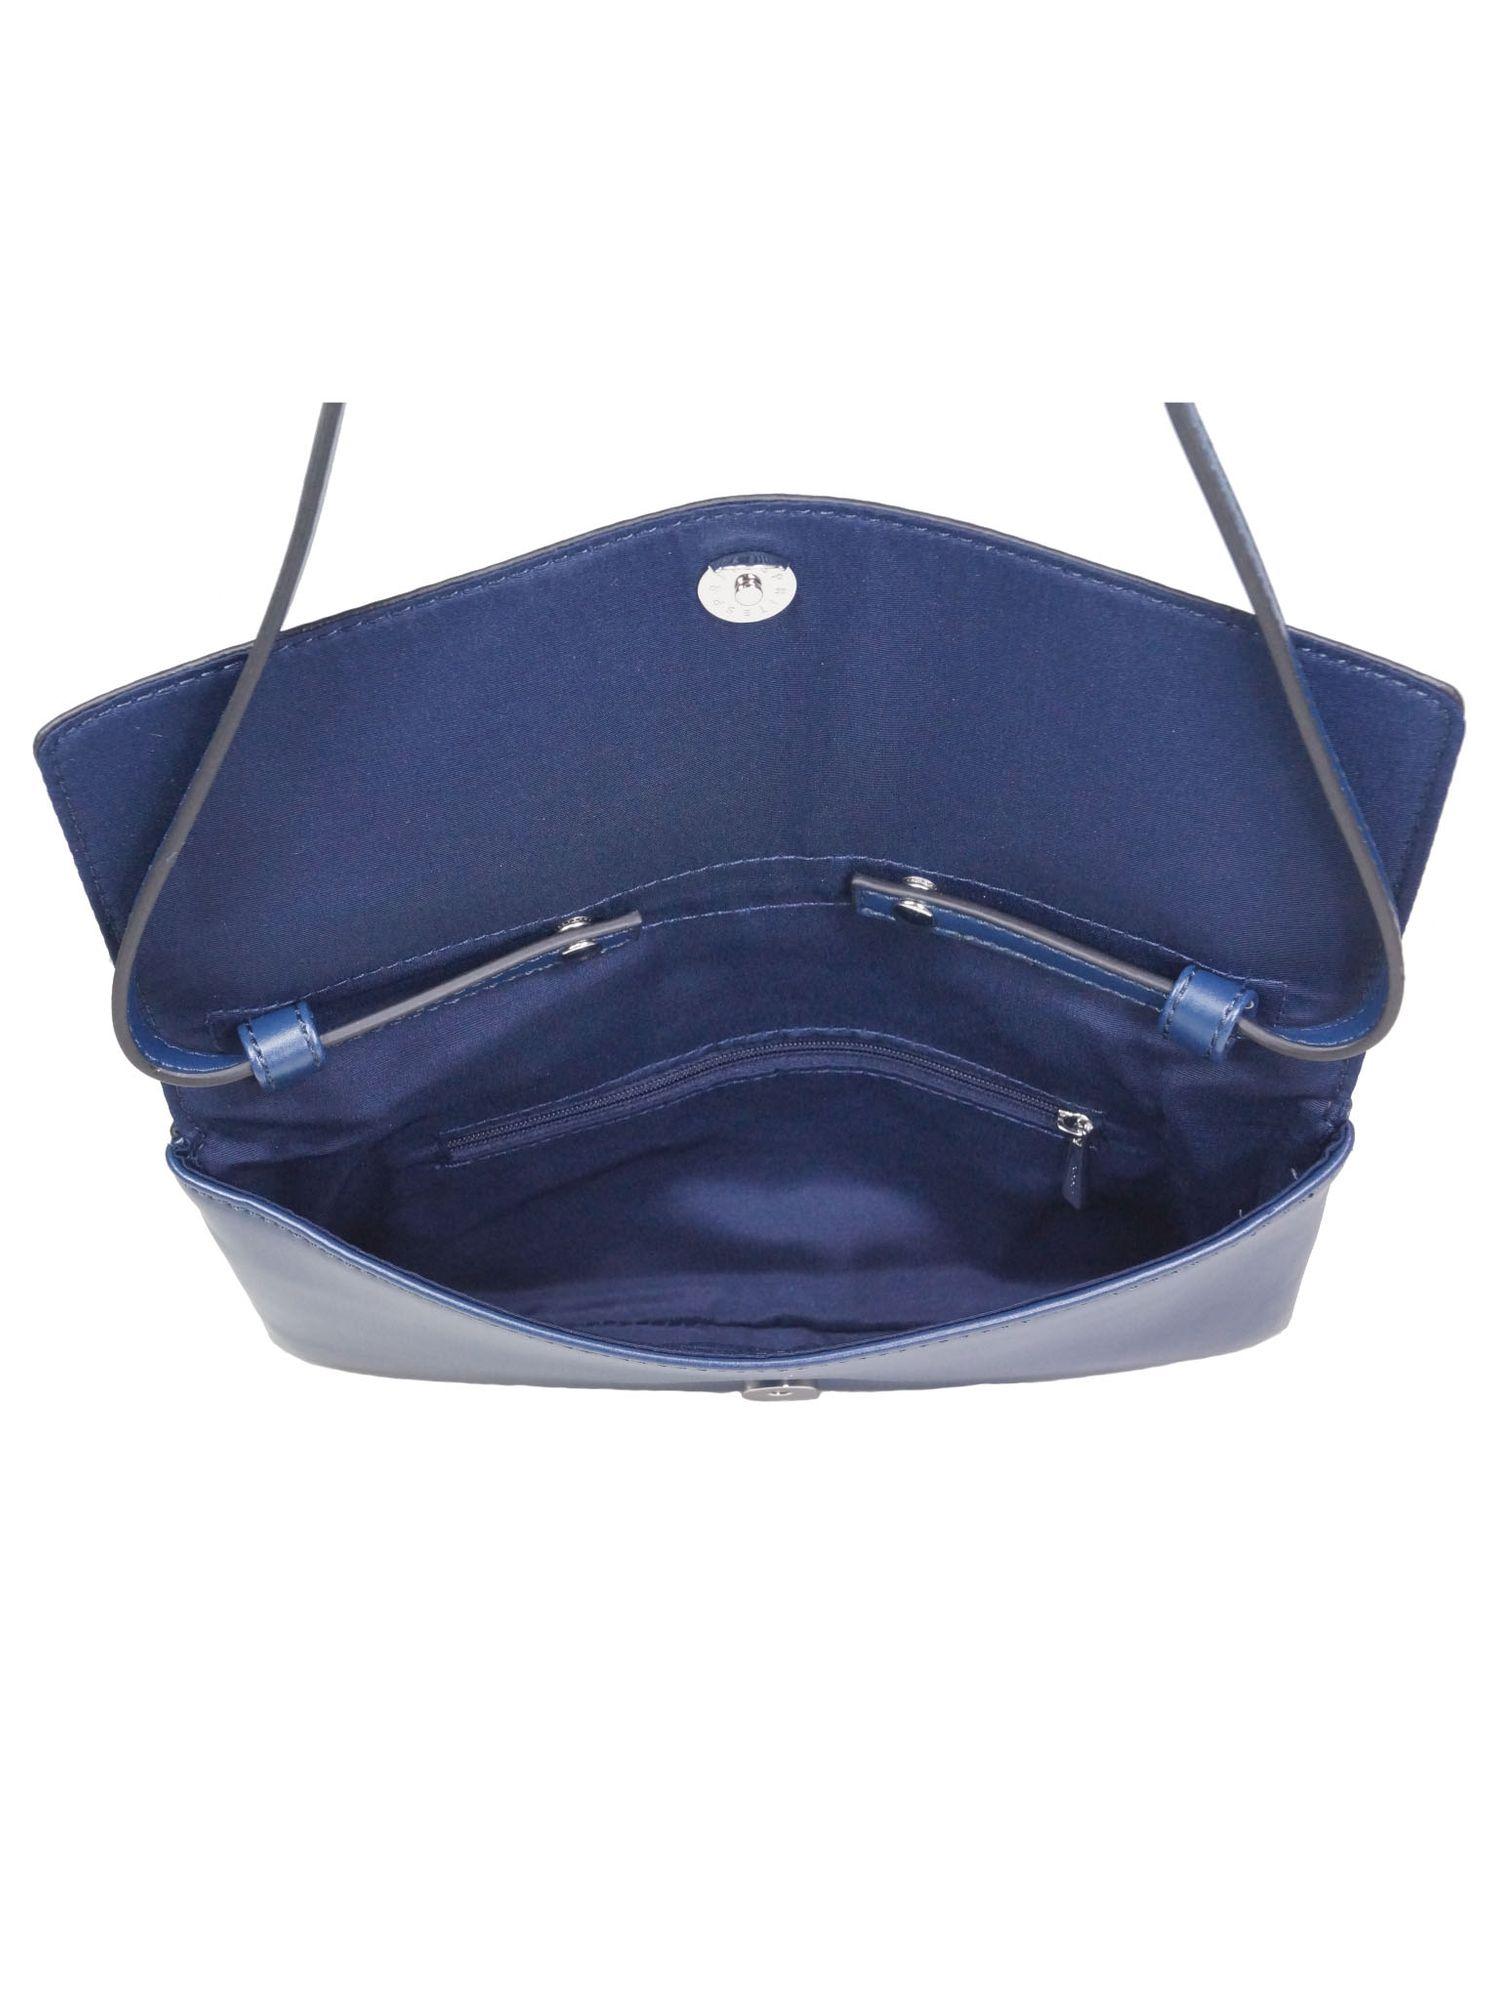 5ecbf0fcd4f04 Esprit Damen Handtasche Clutch Fay Baguette Bag Blau - Kaufen bei ...